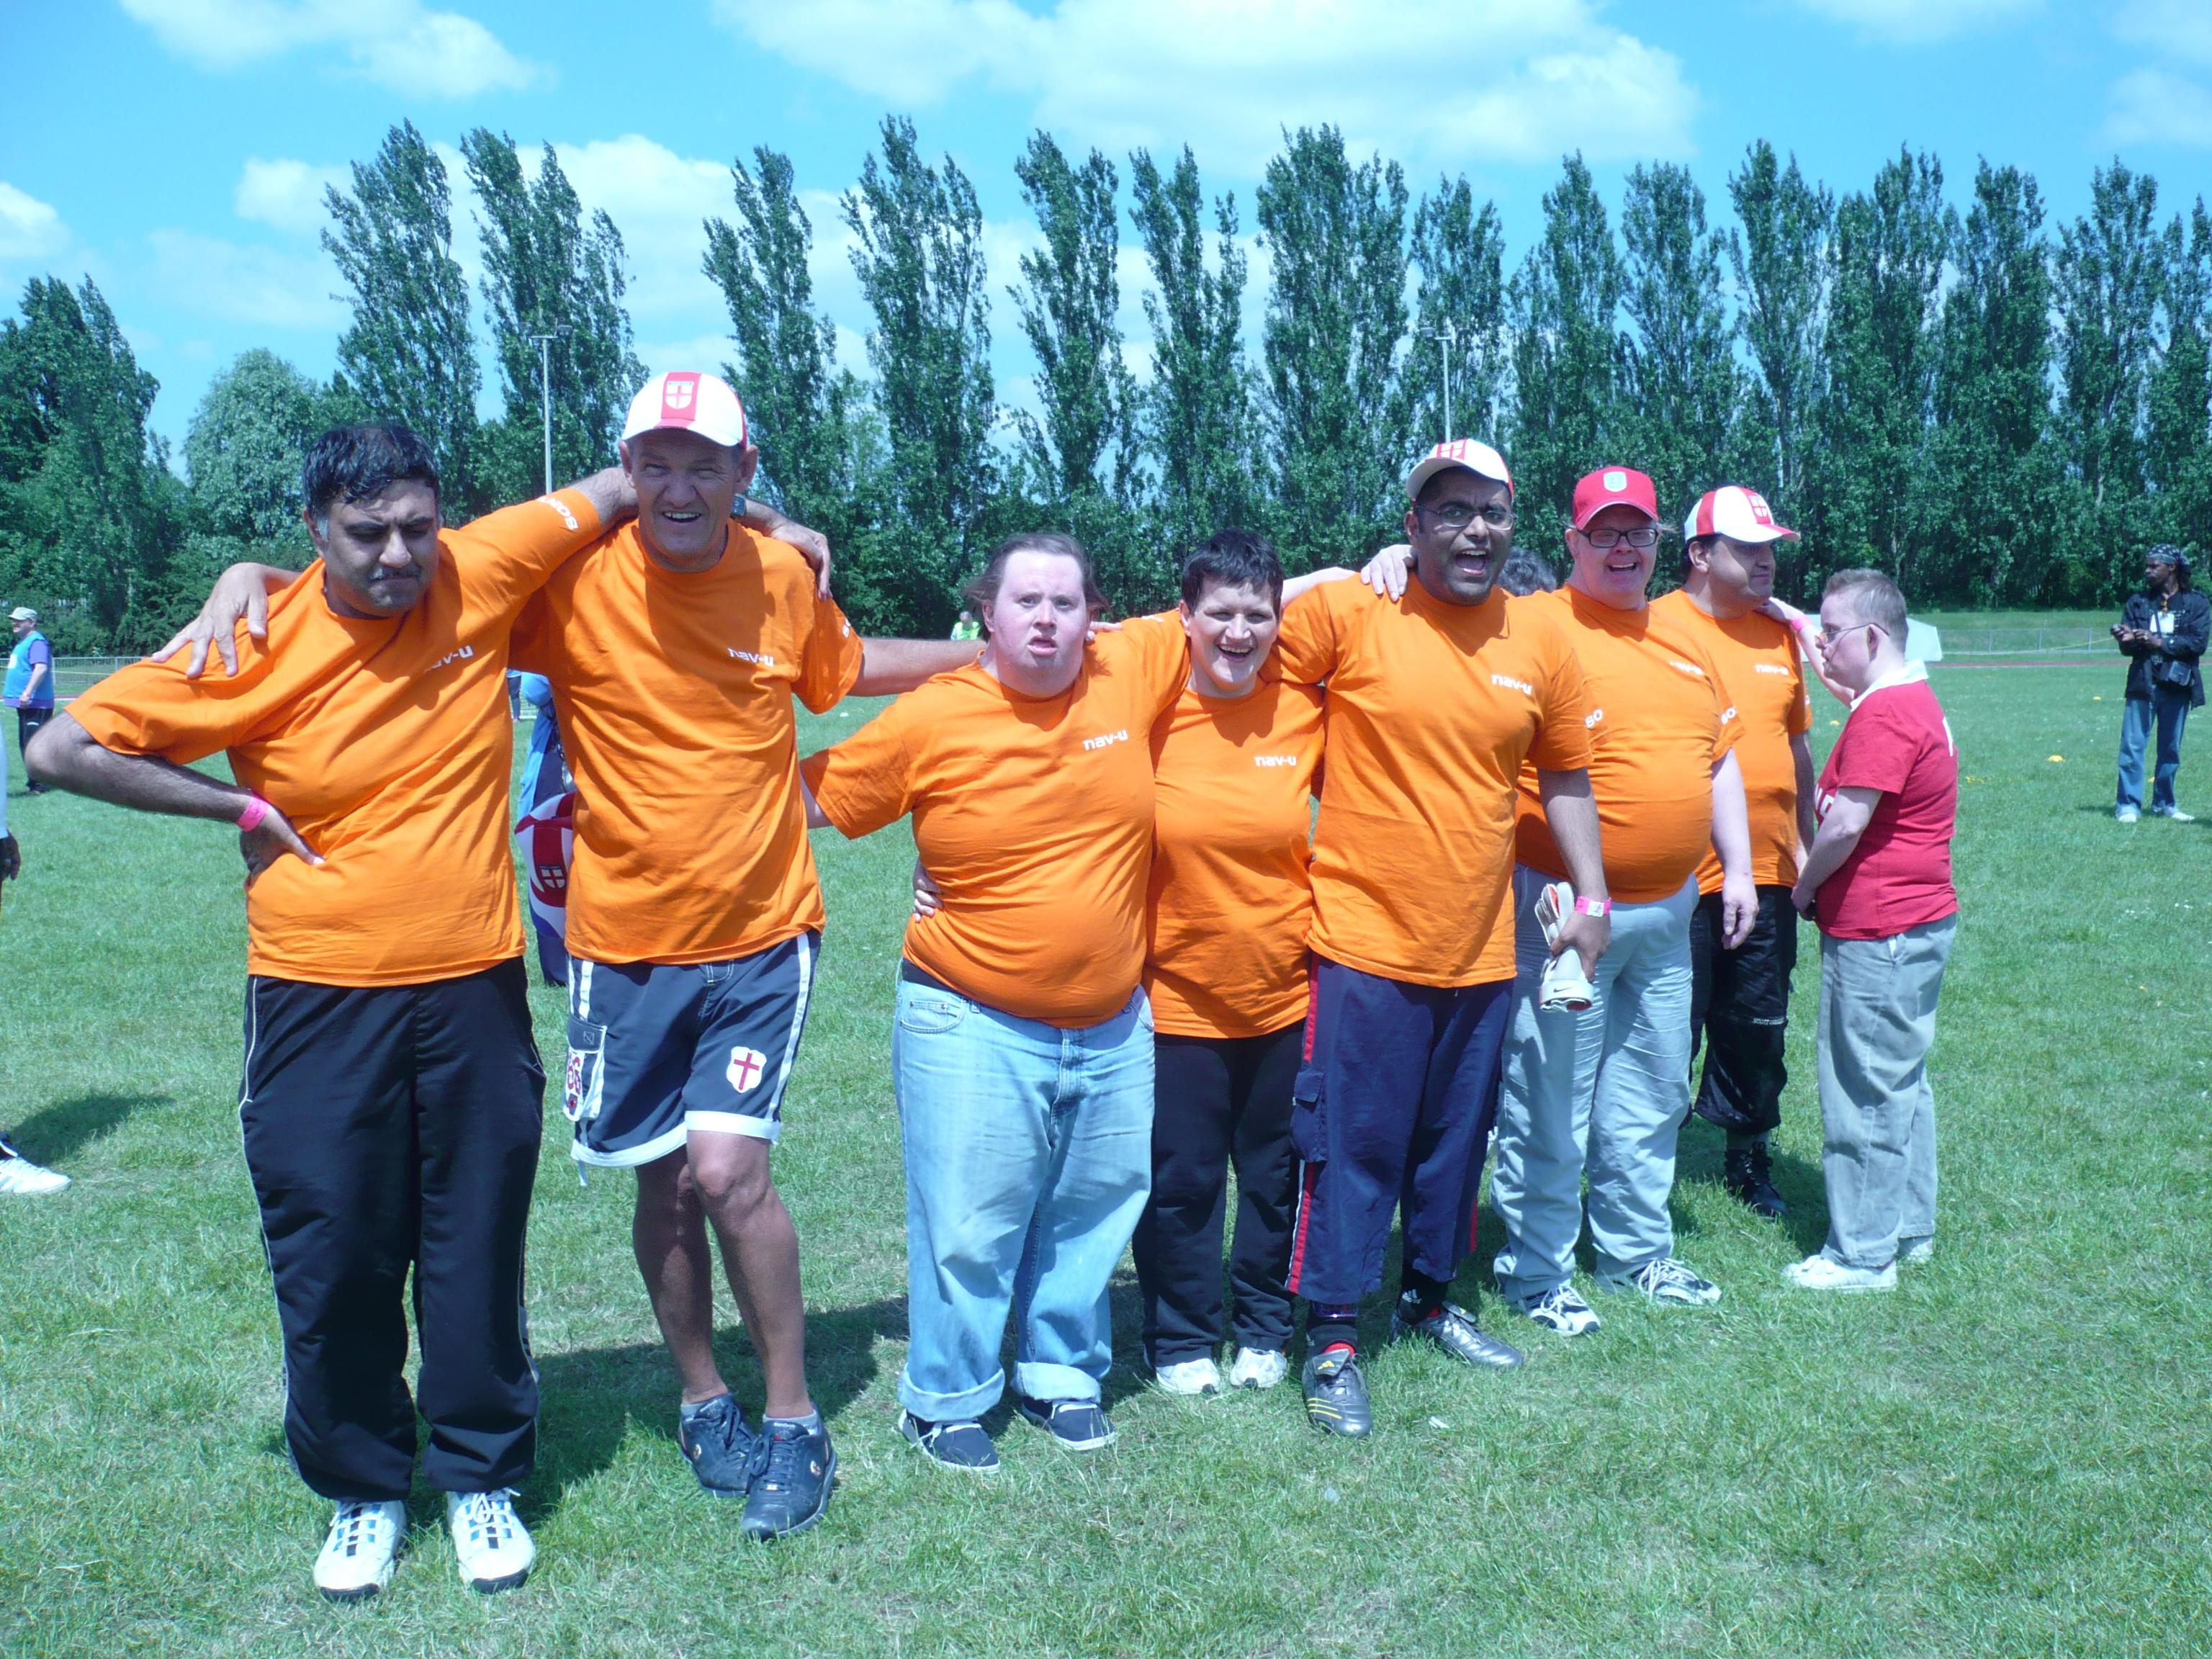 SEN sportsday 2010.JPG